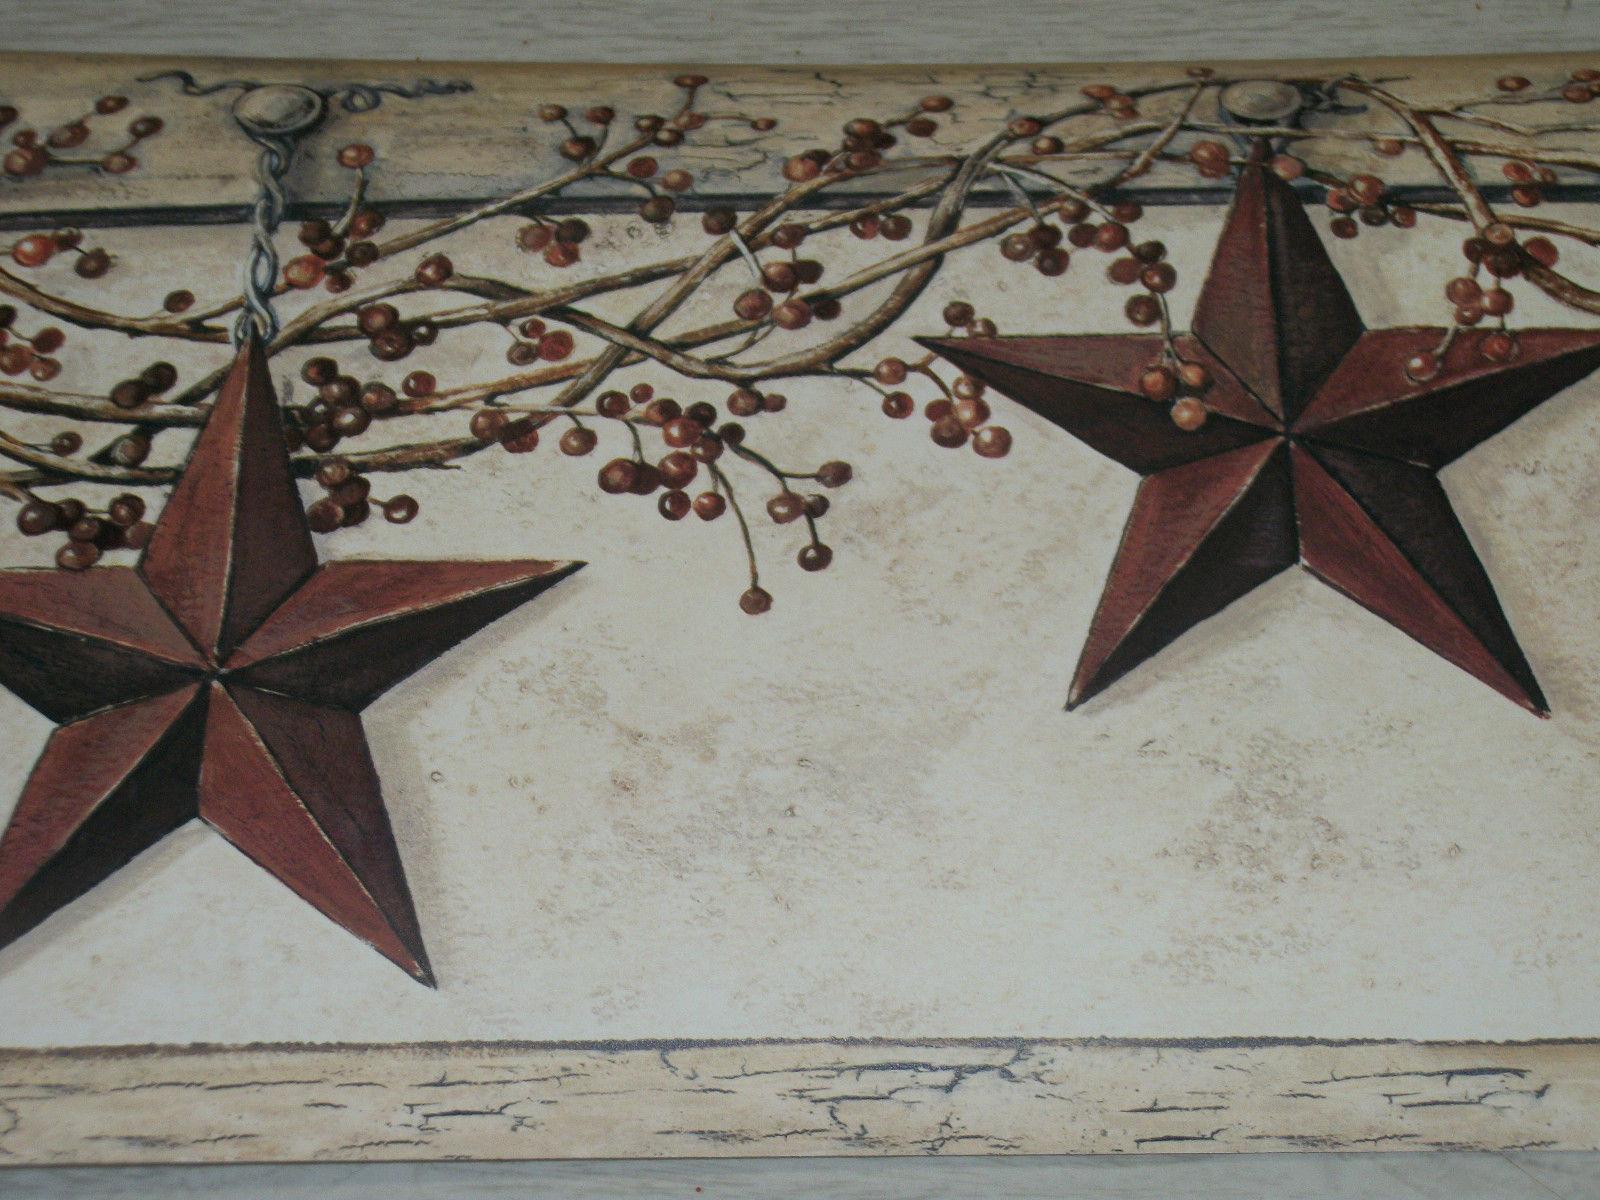 Steves Wallpaper Discount Wallpaper Murals Borders Home Design Ideas 1600x1200